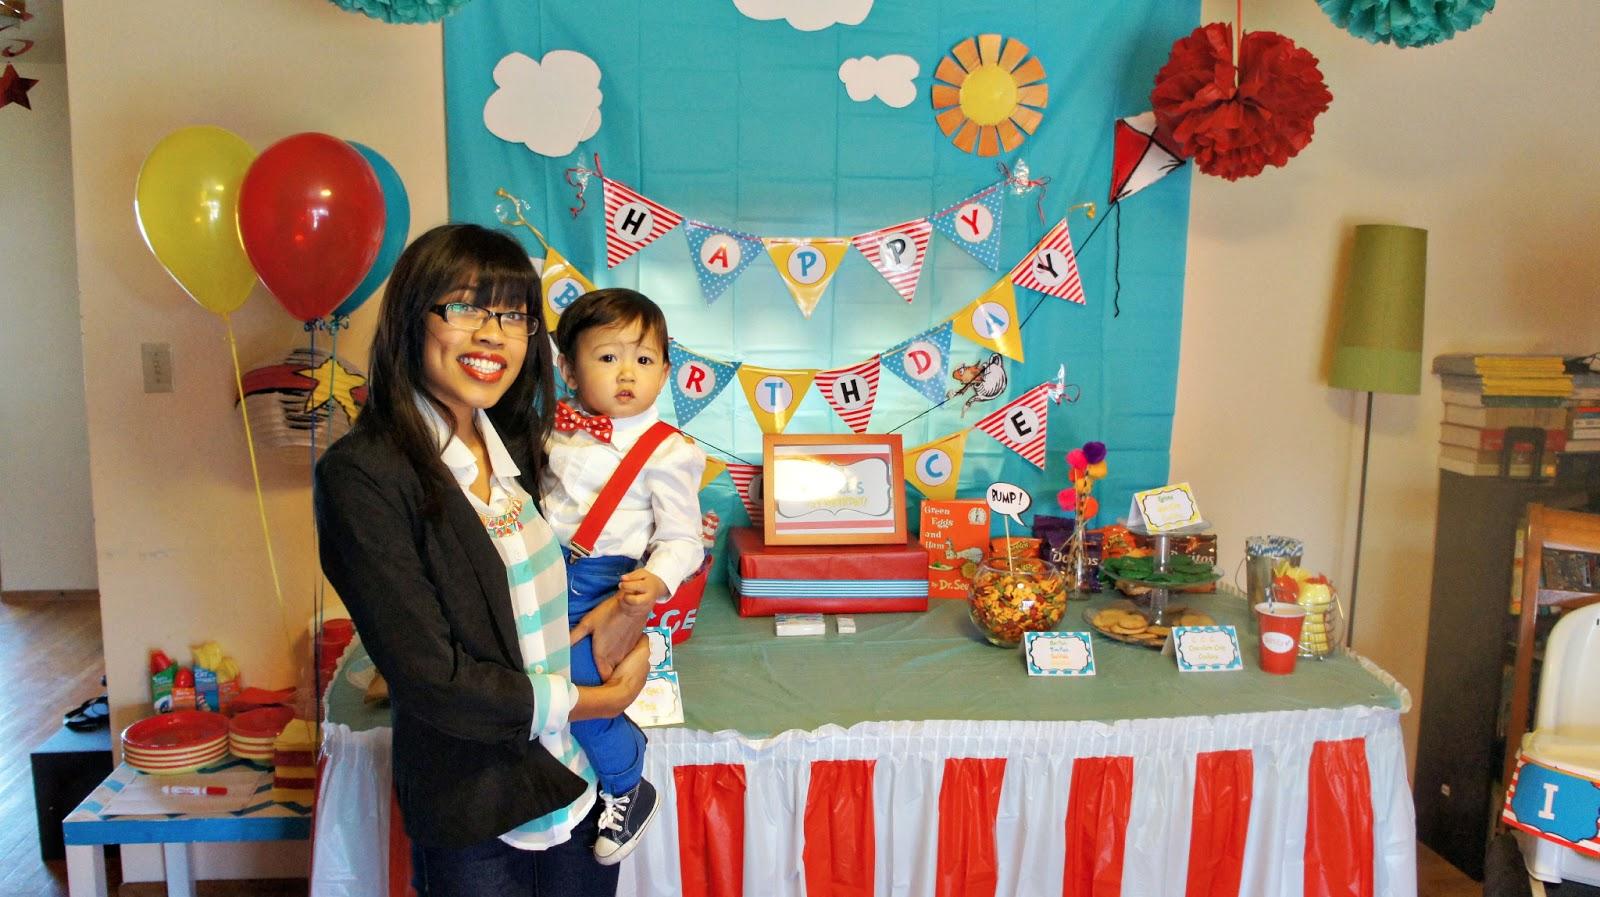 Dr Seuss Theme Baby Room Site Www Target Com